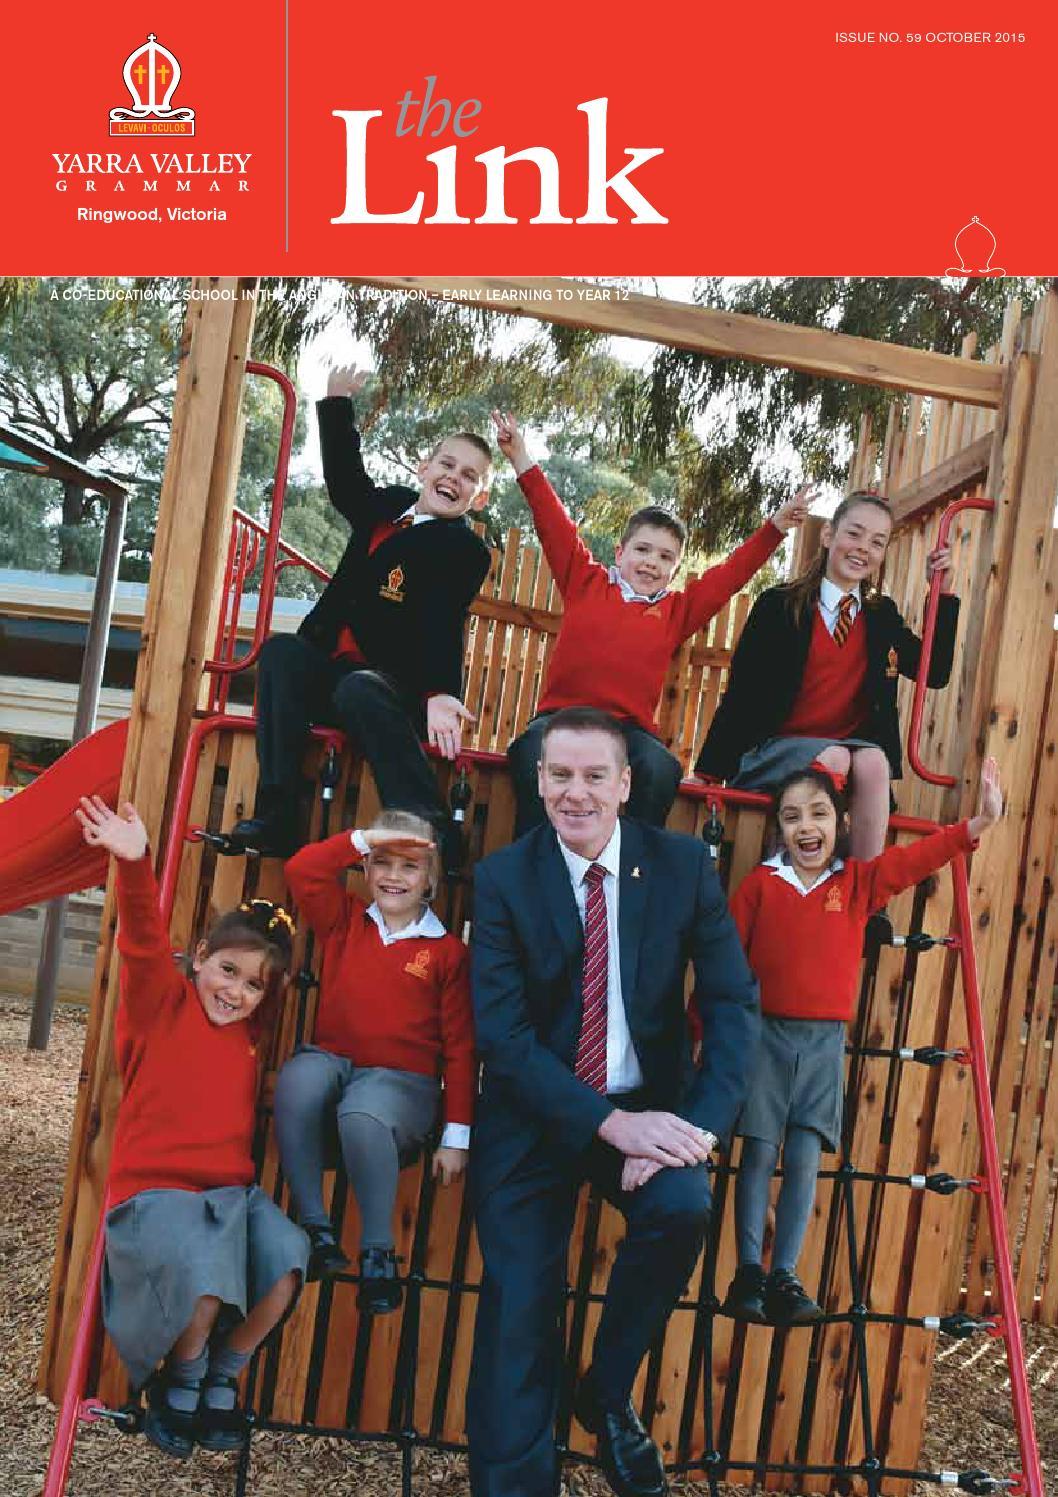 93928689127 ISSUE NO. 59 OCTOBER 2015 by Yarra Valley Grammar - issuu